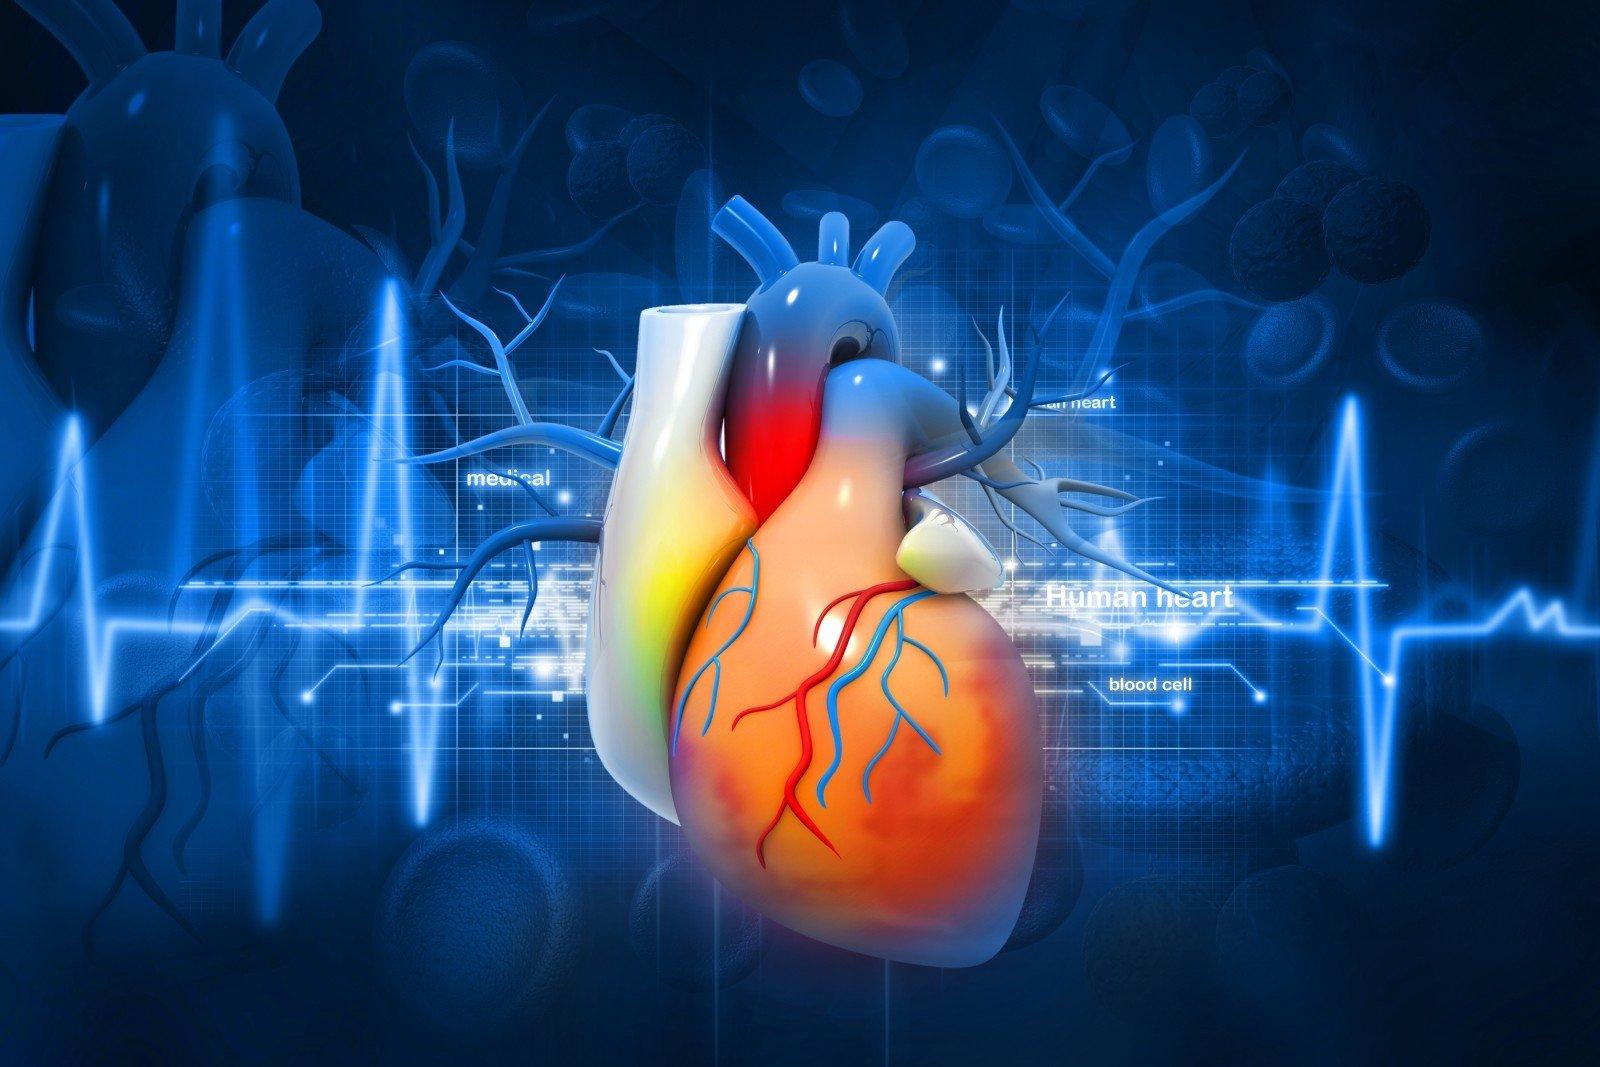 Paprastas būdas patikrinti širdies sveikatą: užtruksite vos 5 minutes | mul.lt